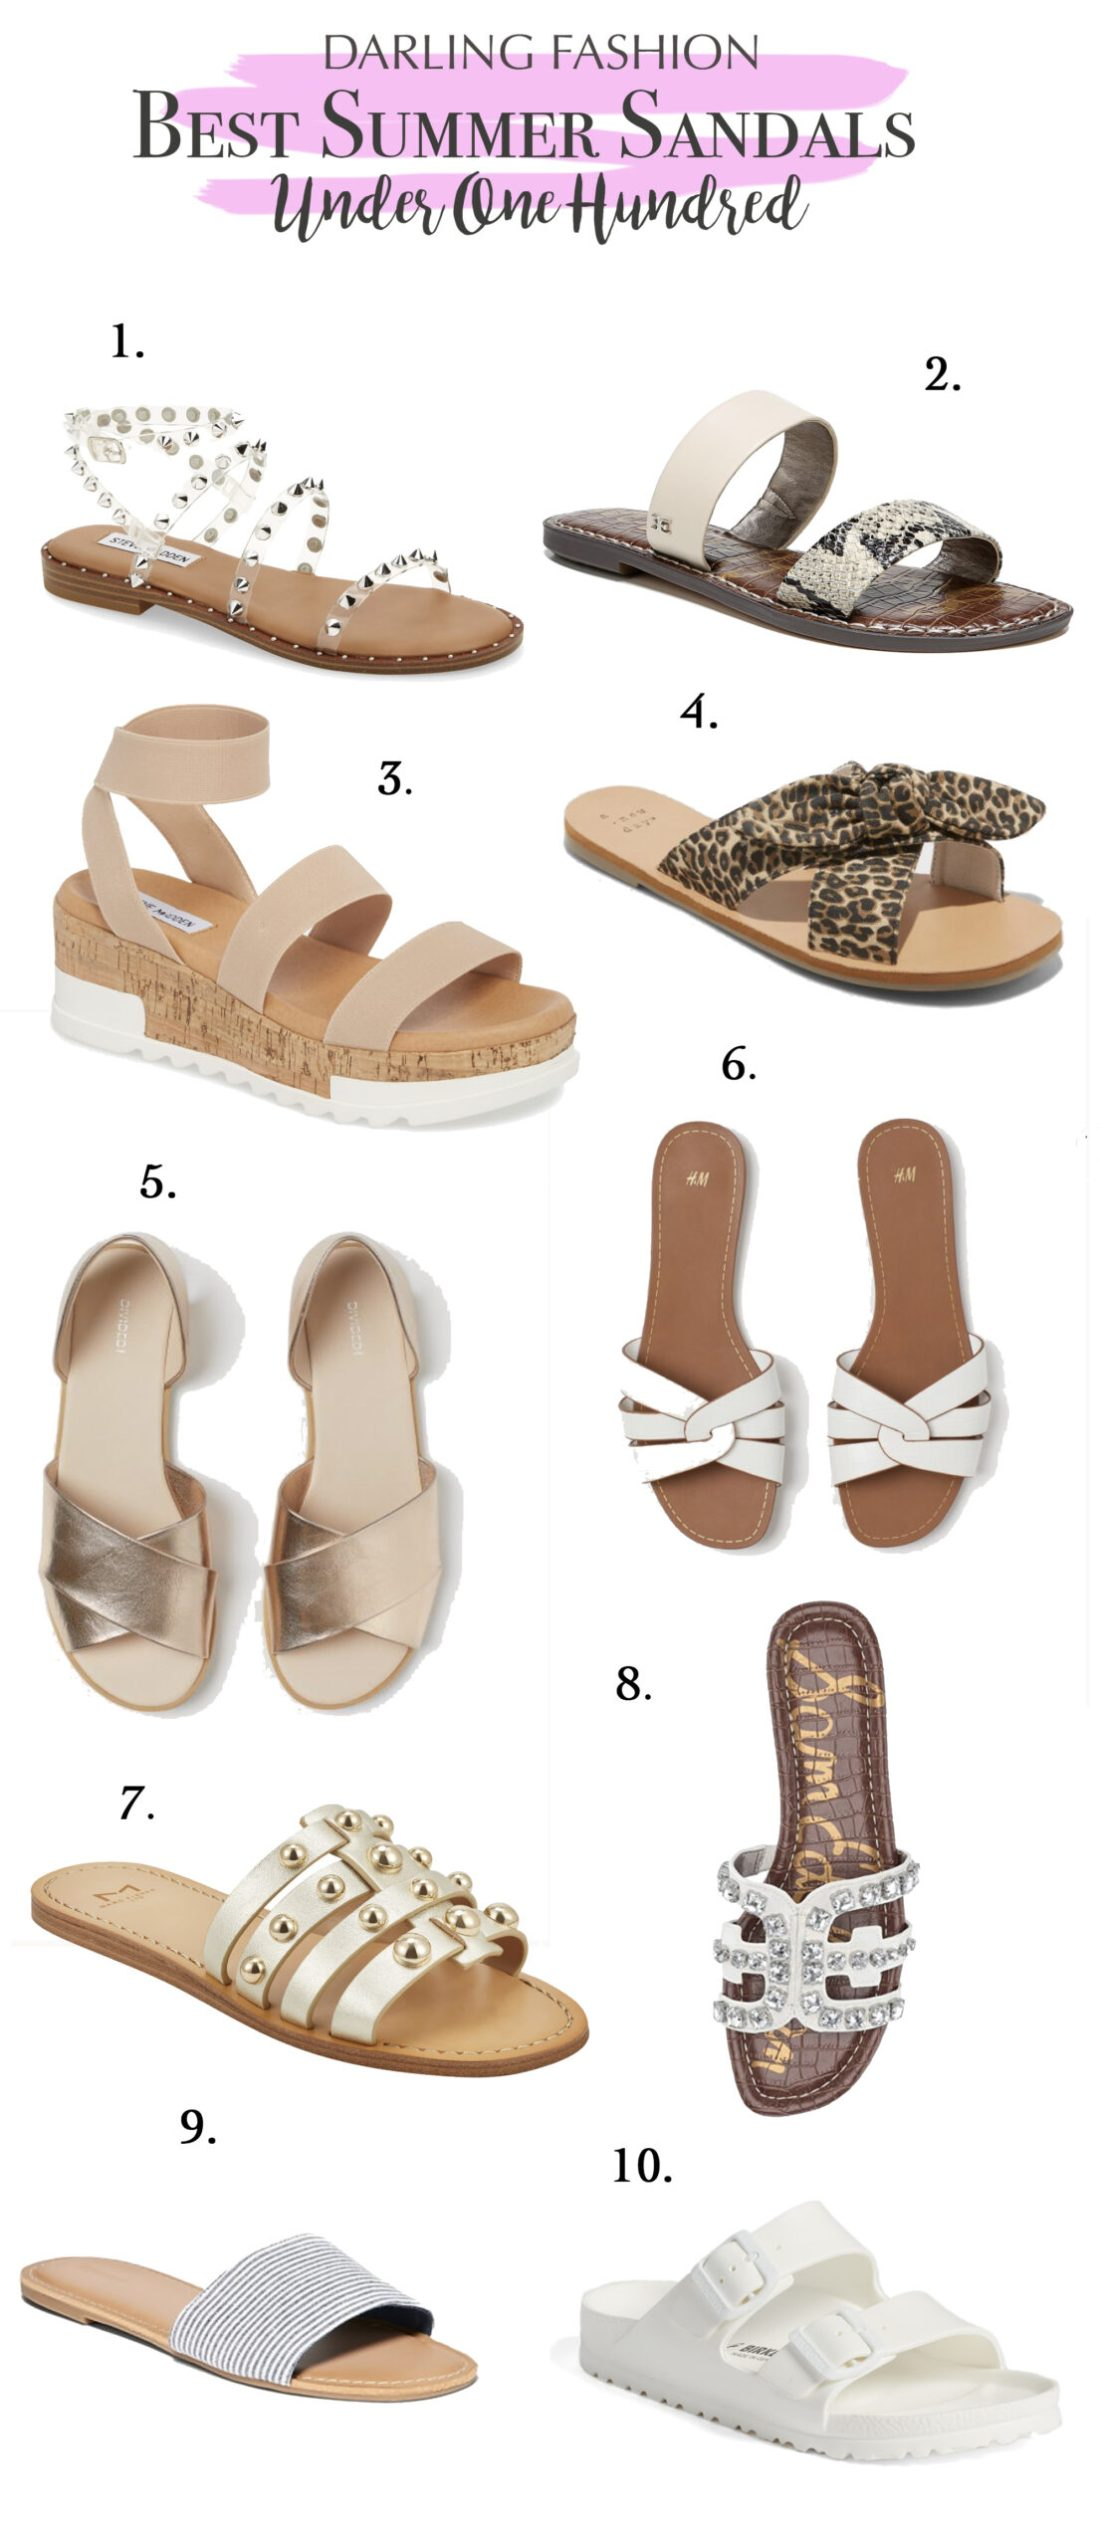 Best Summer Sandals under $100 that are on trend this season    Darling Darleen Top Lifestyle CT Blogger #summersandals #sandalsunder100